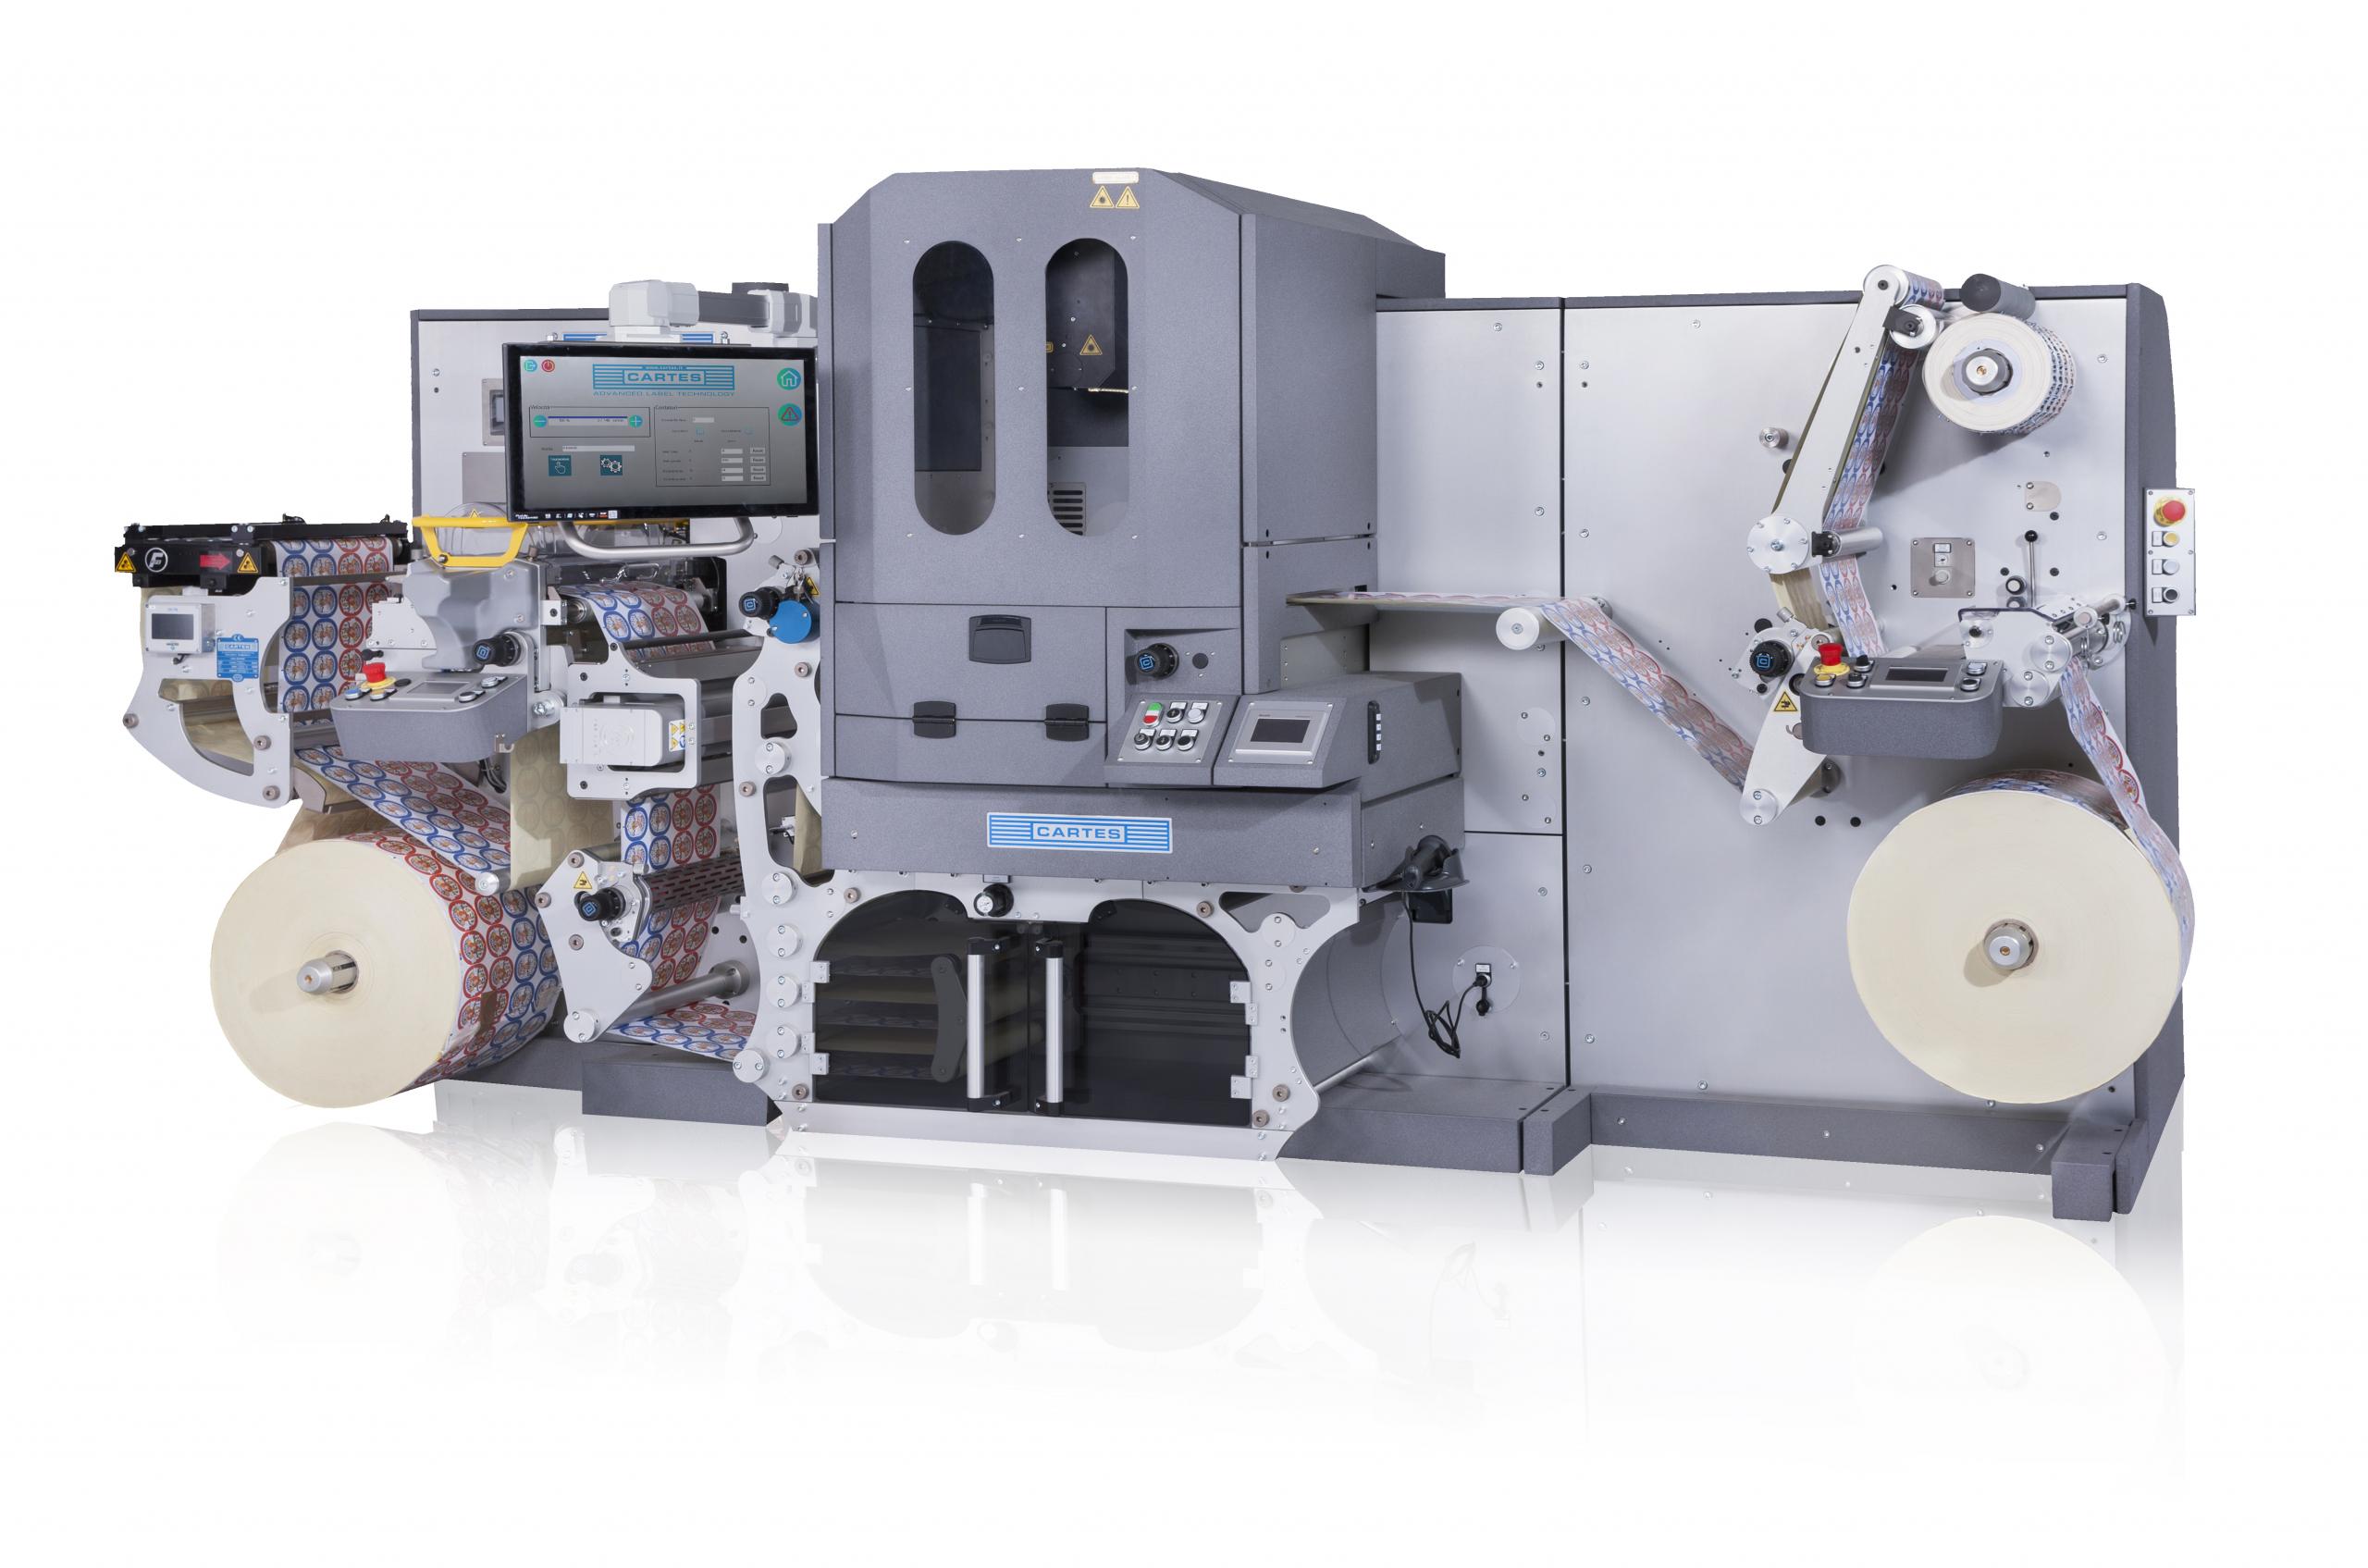 GE362VL-E-Line-prosp_machine front